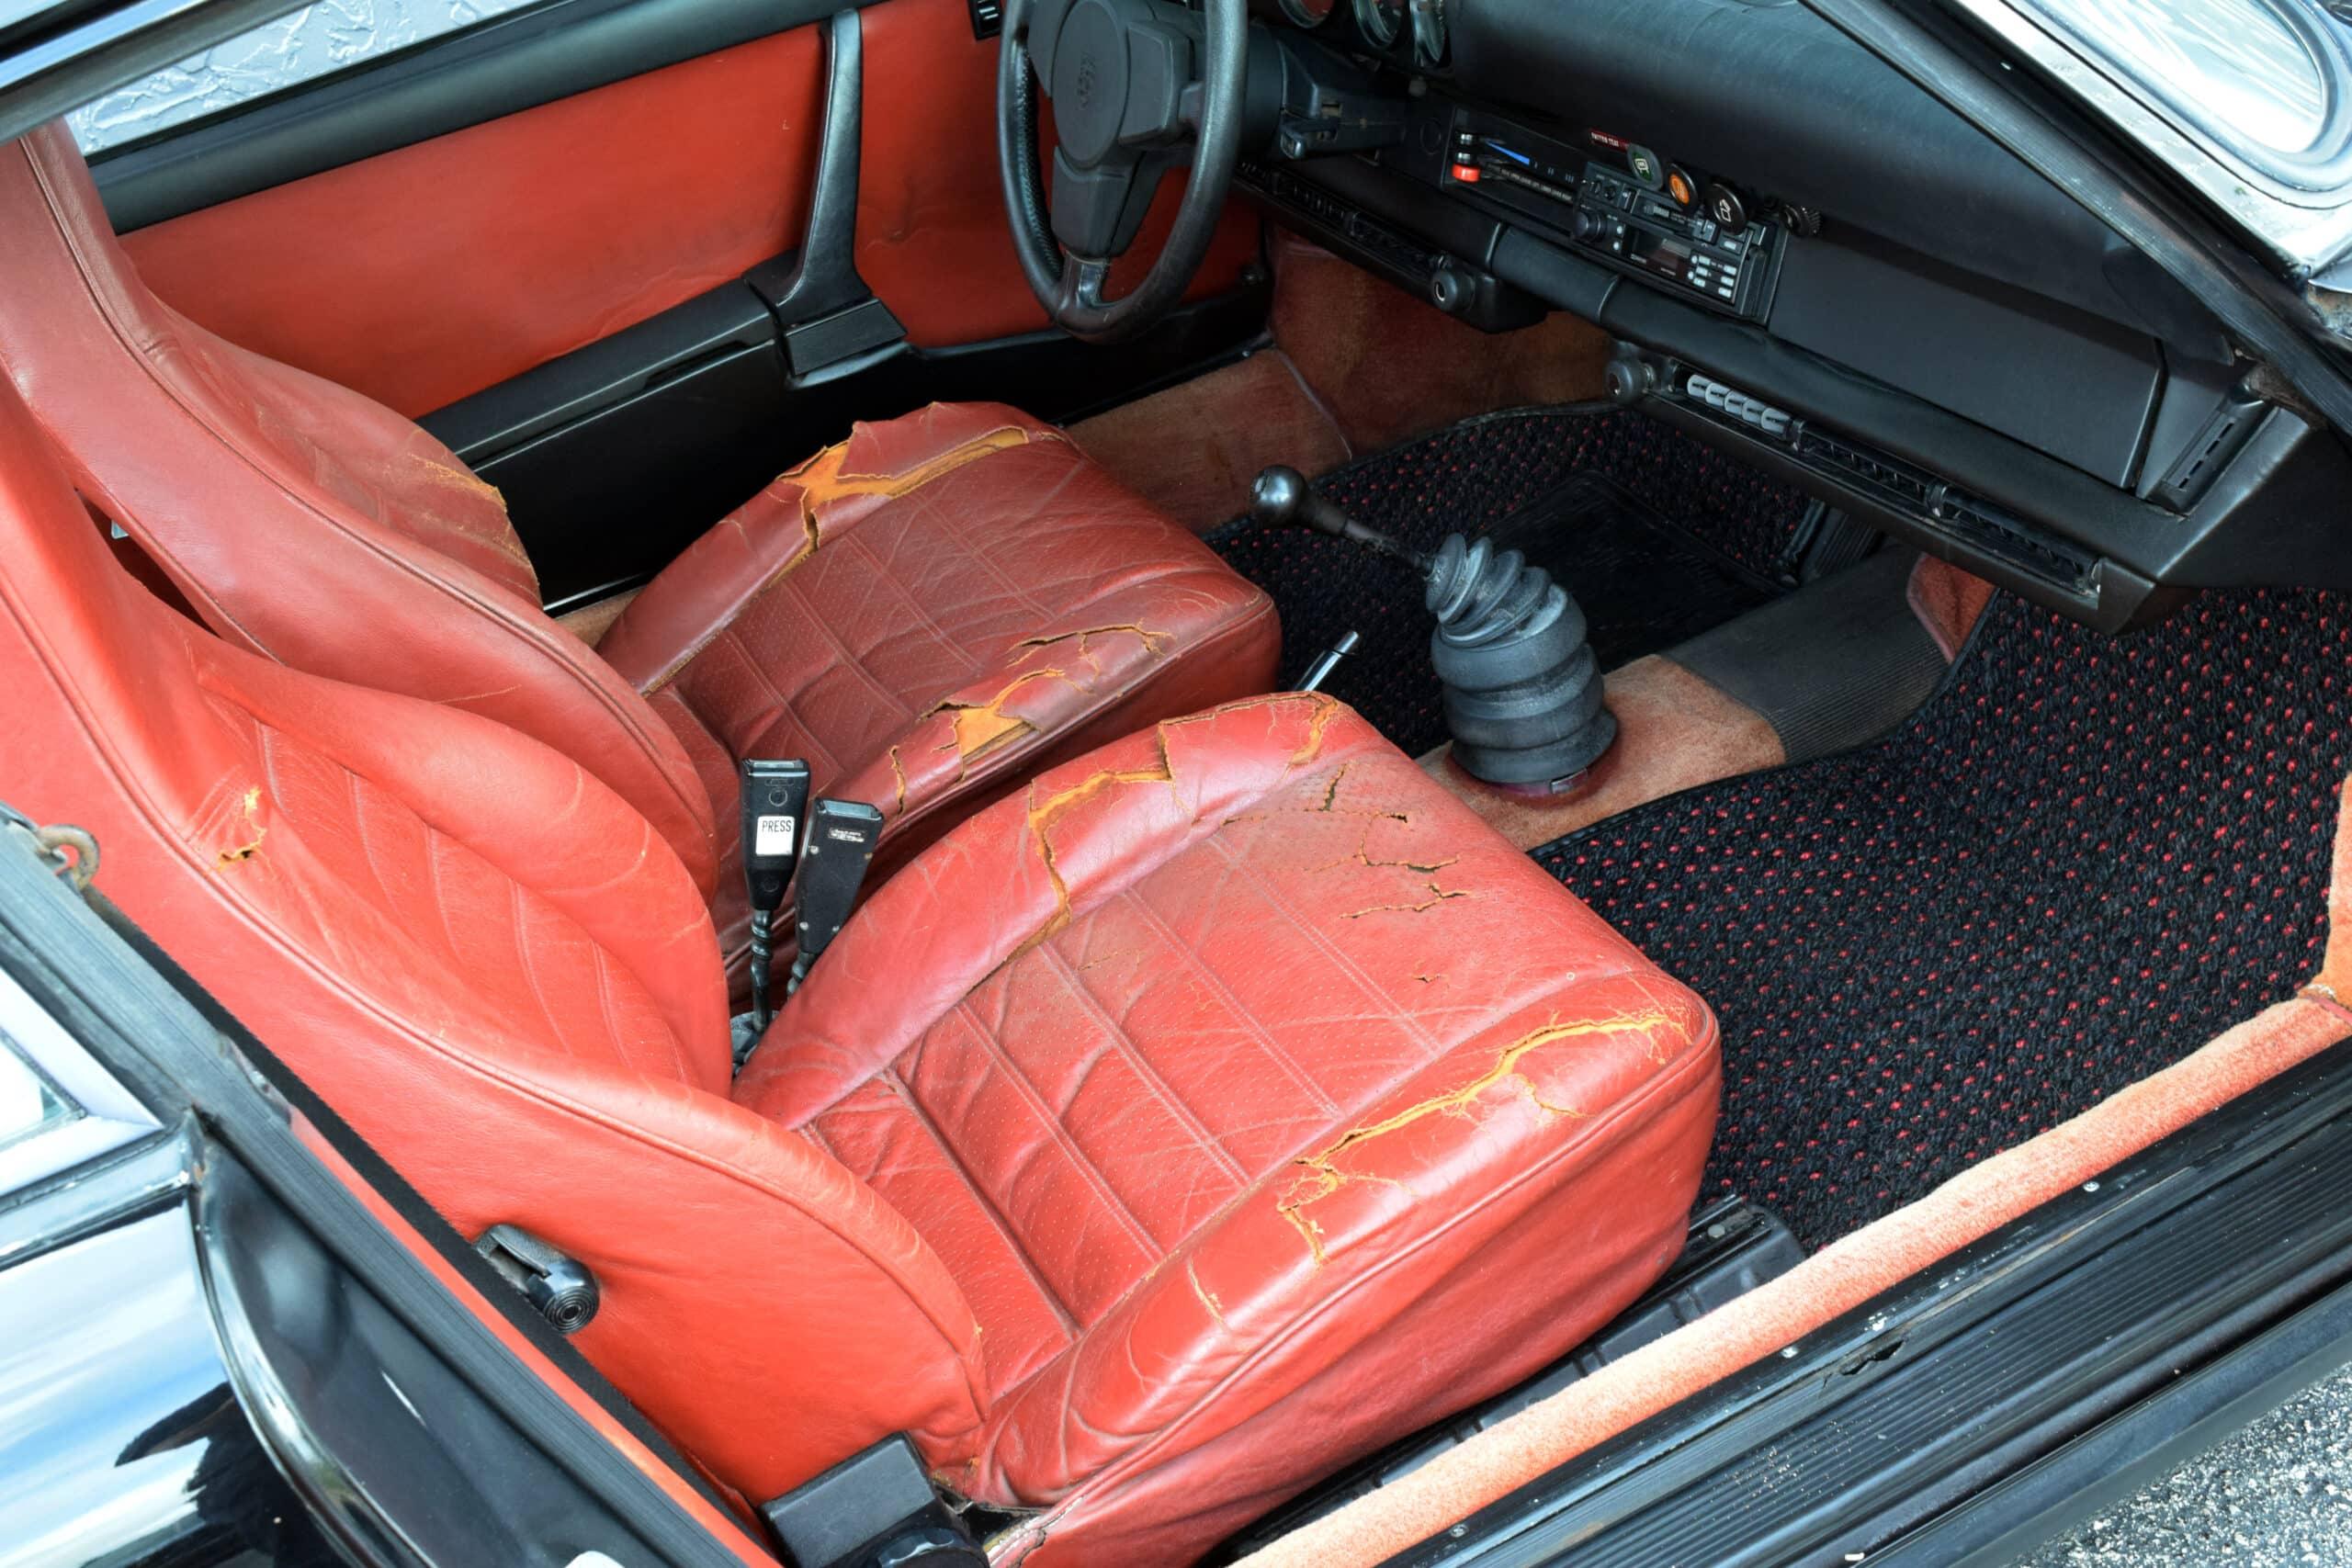 1974 911 Sunroof Carrera US, one of just 518 made, Barn Find, Original interior, Carrera Ducktail, original Manuals and Tools